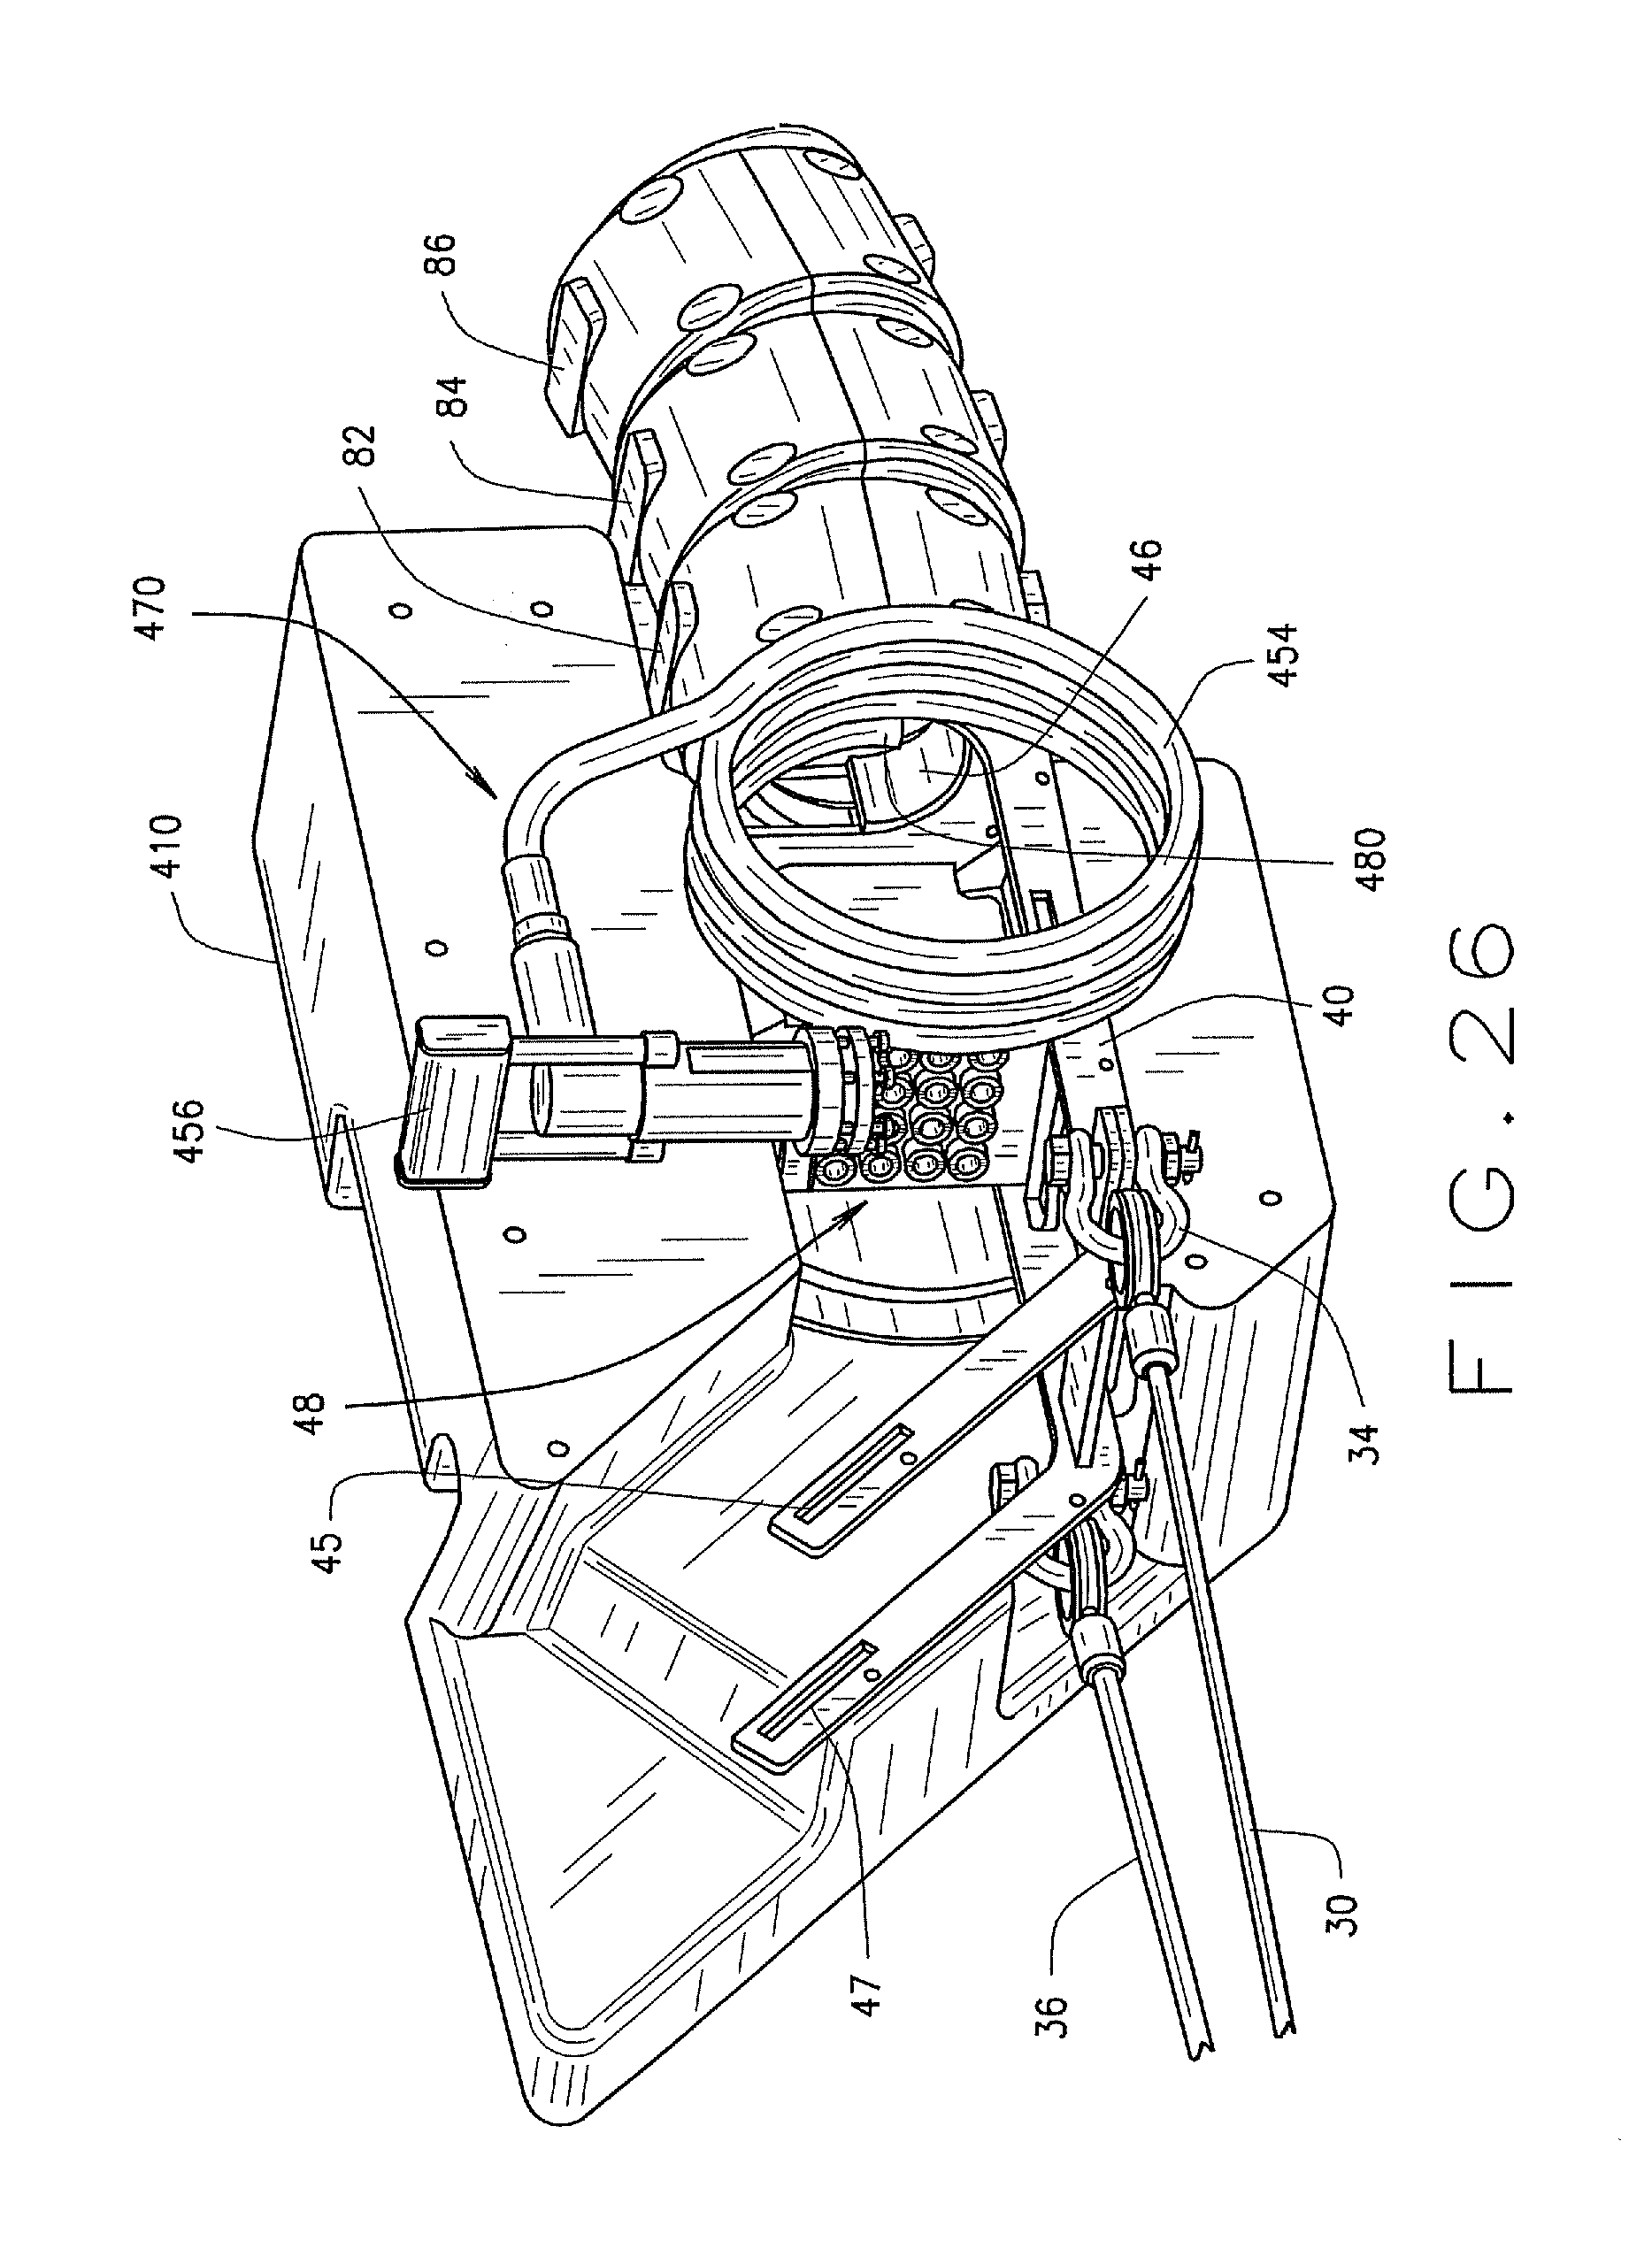 Wrg Suzuki Aerio Engine Diagram